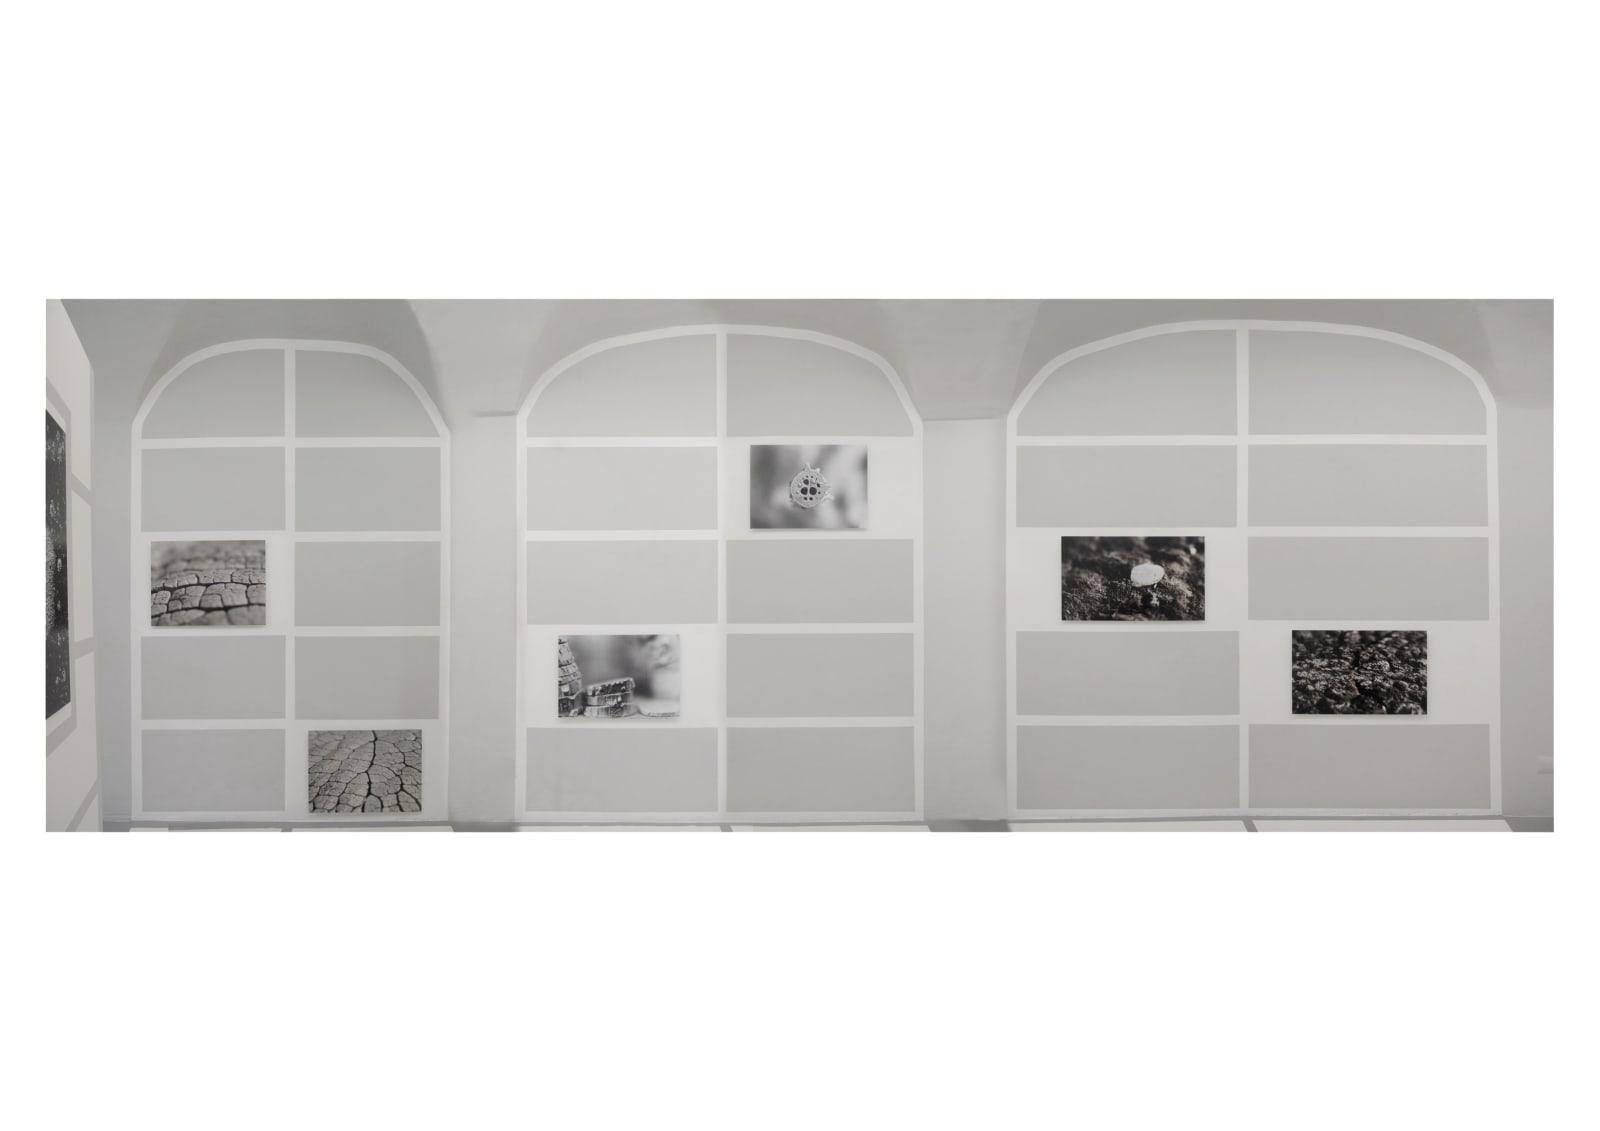 Michele Guido, z2o Garden Project, installation view at z2o Sara Zanin Gallery